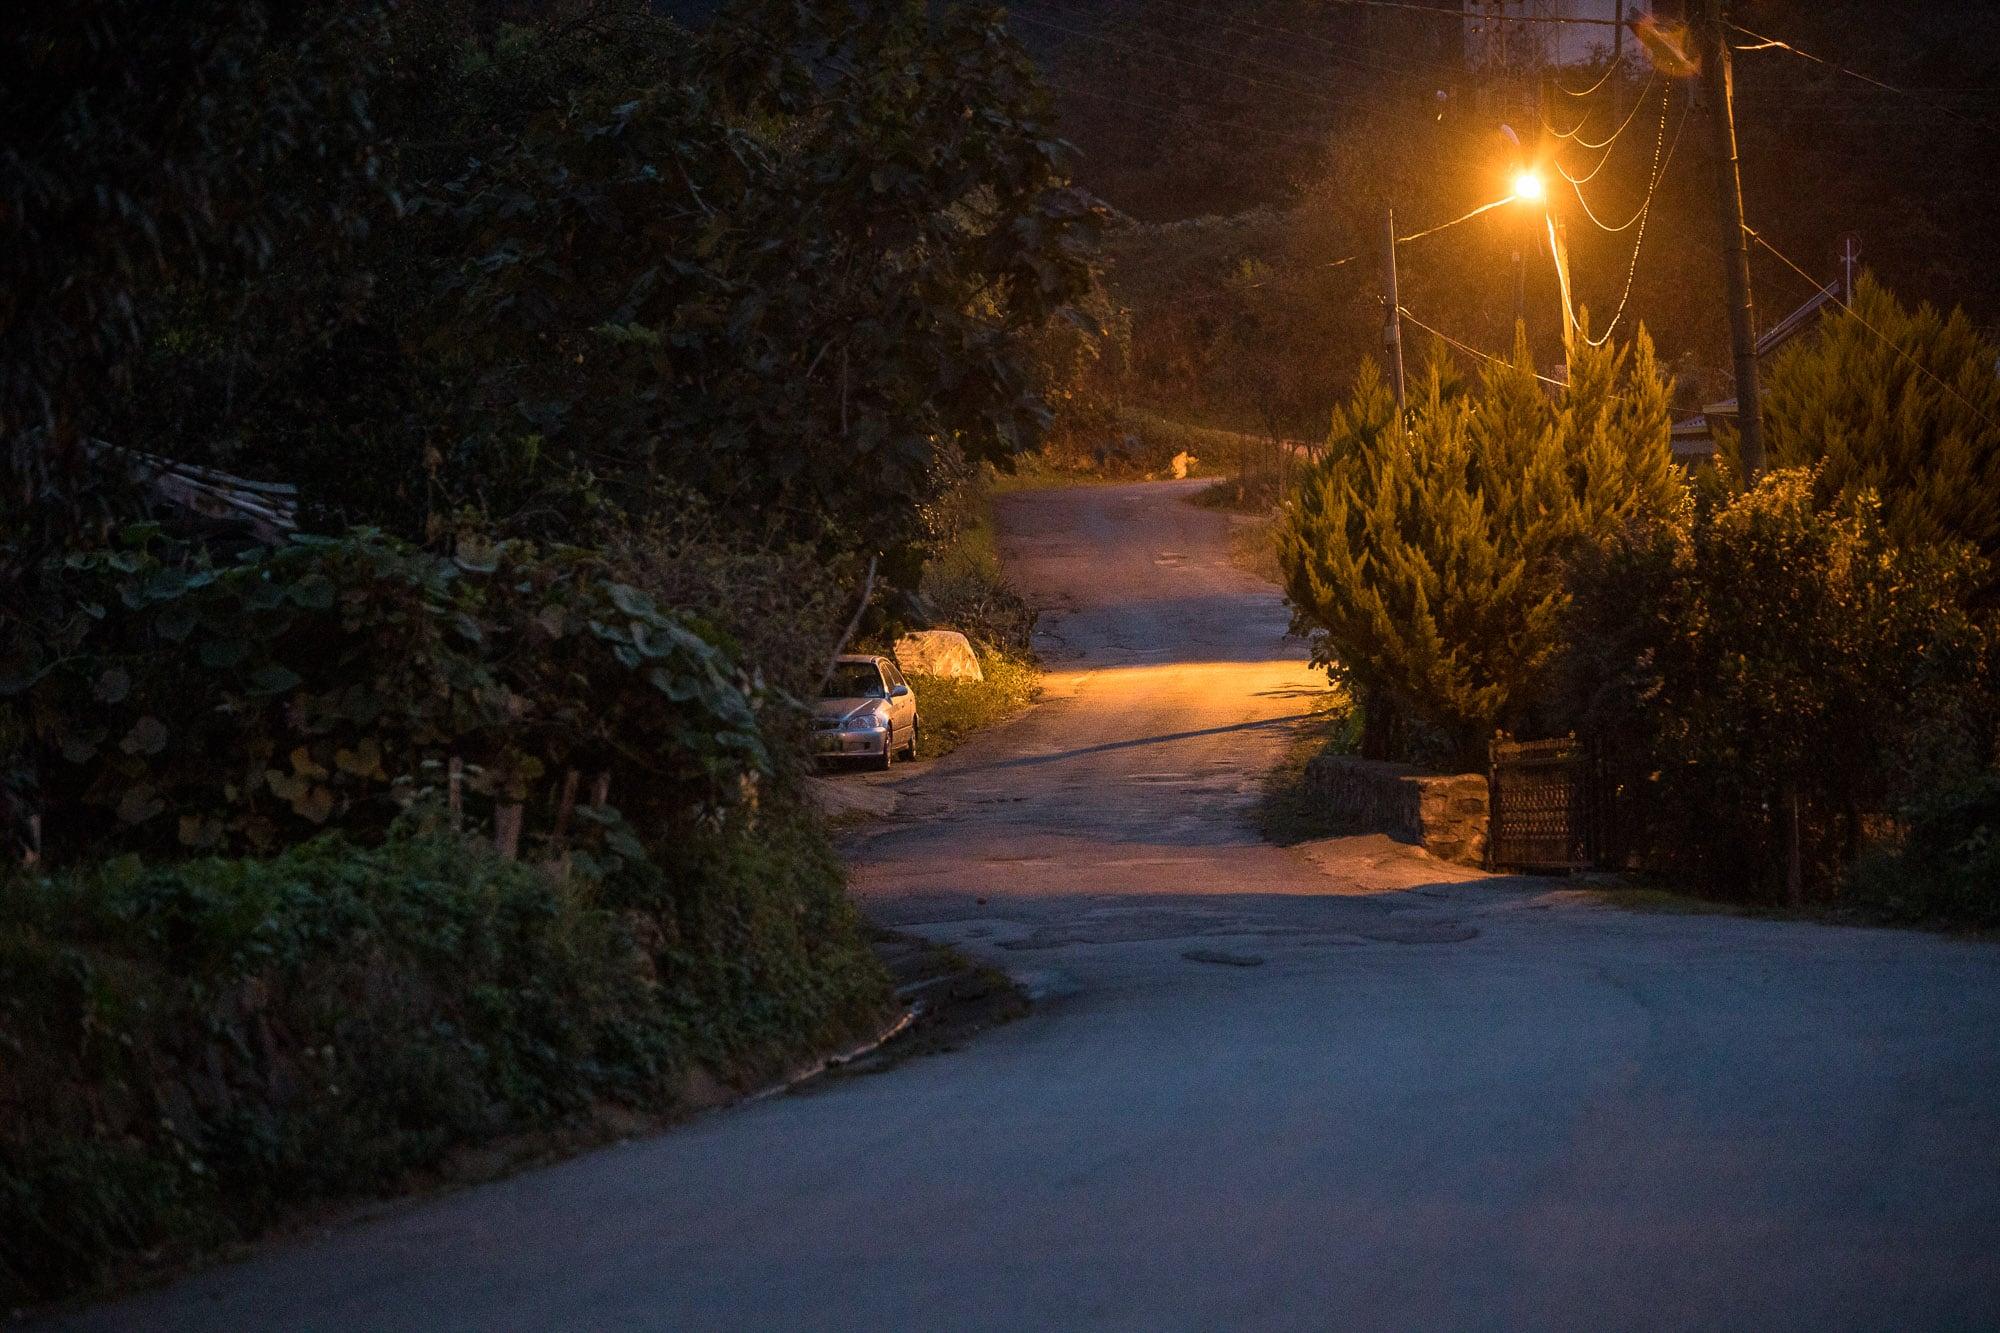 arriving in Giresun